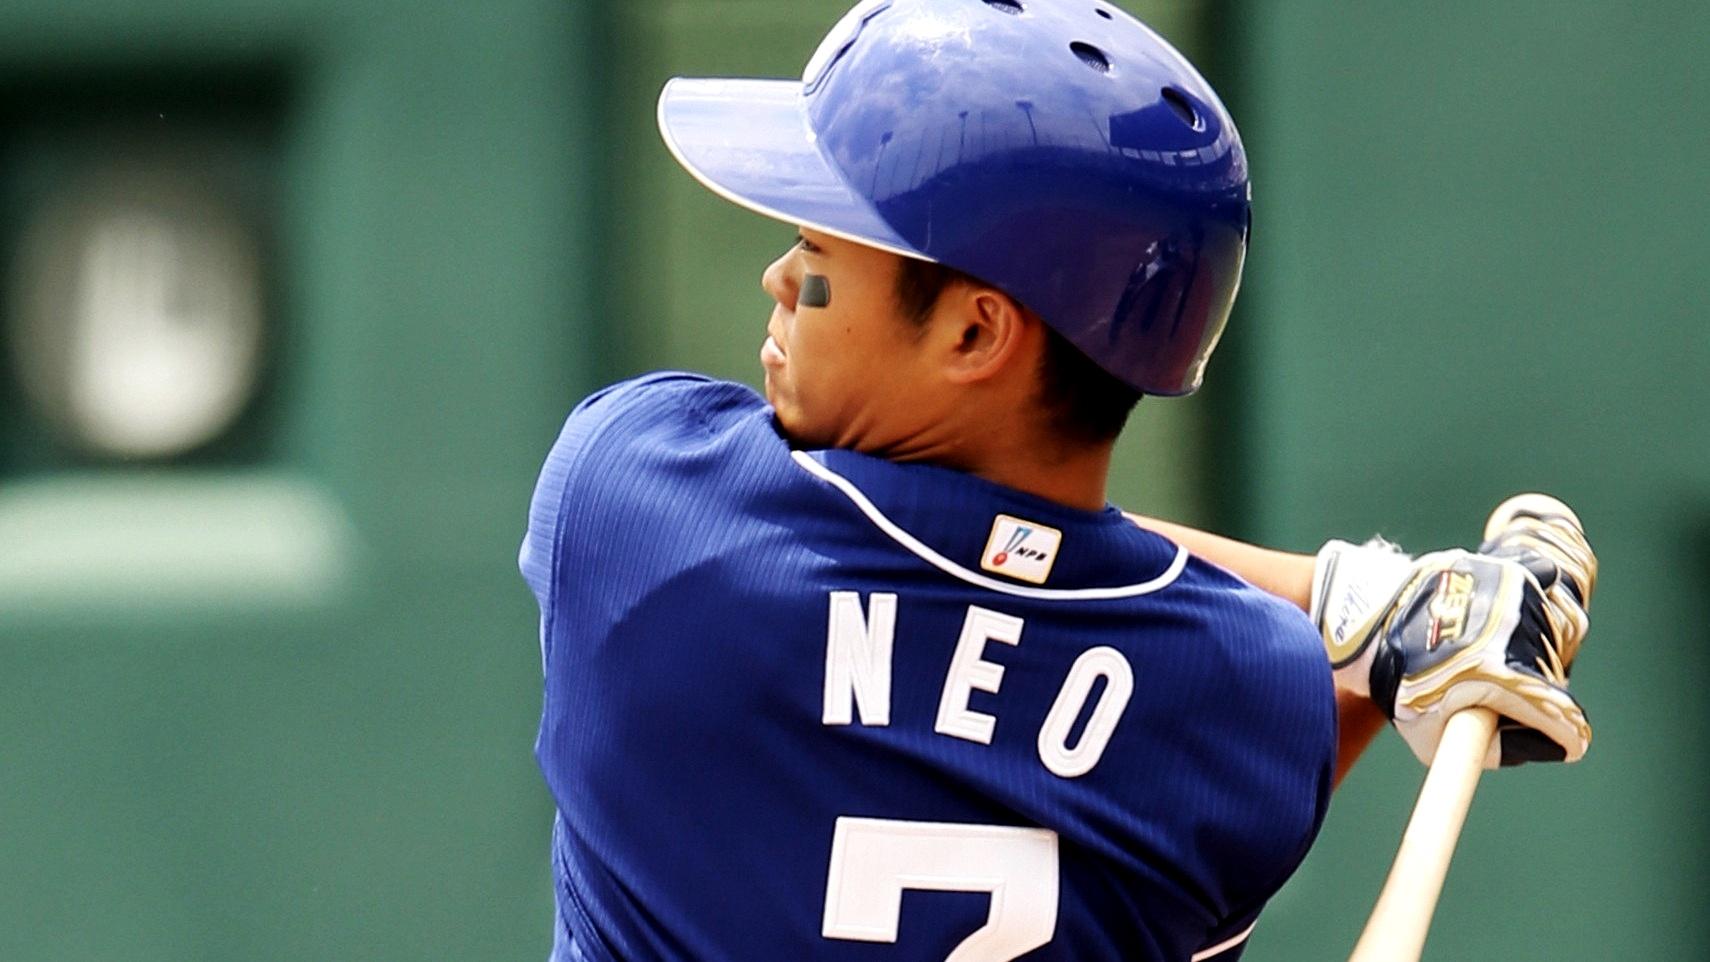 2019-05-28-npb-Dragons-NEO